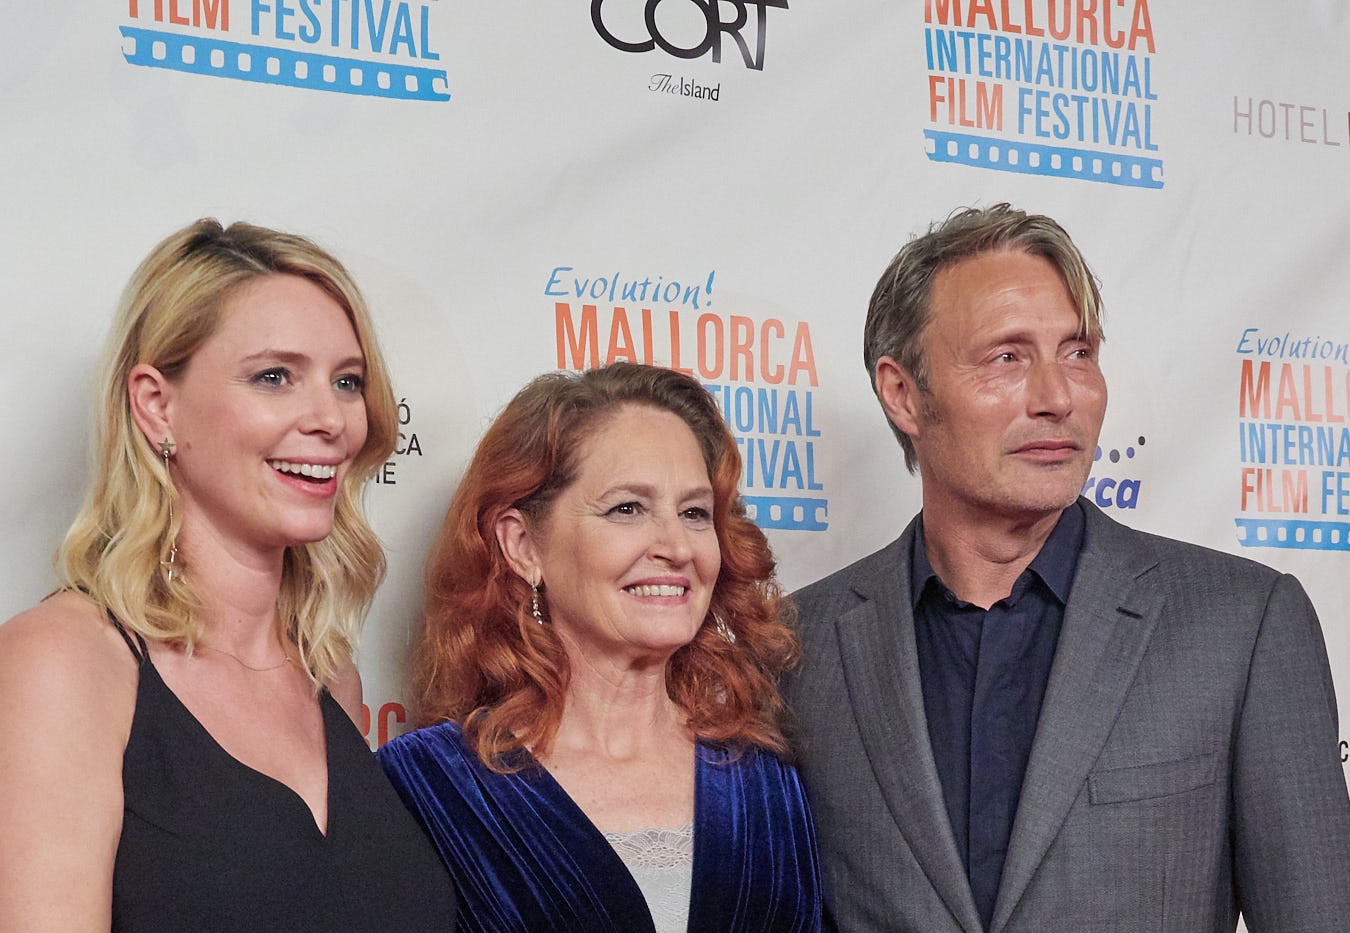 Festival Founder with Melissa Leo and Mads Mikkelsen